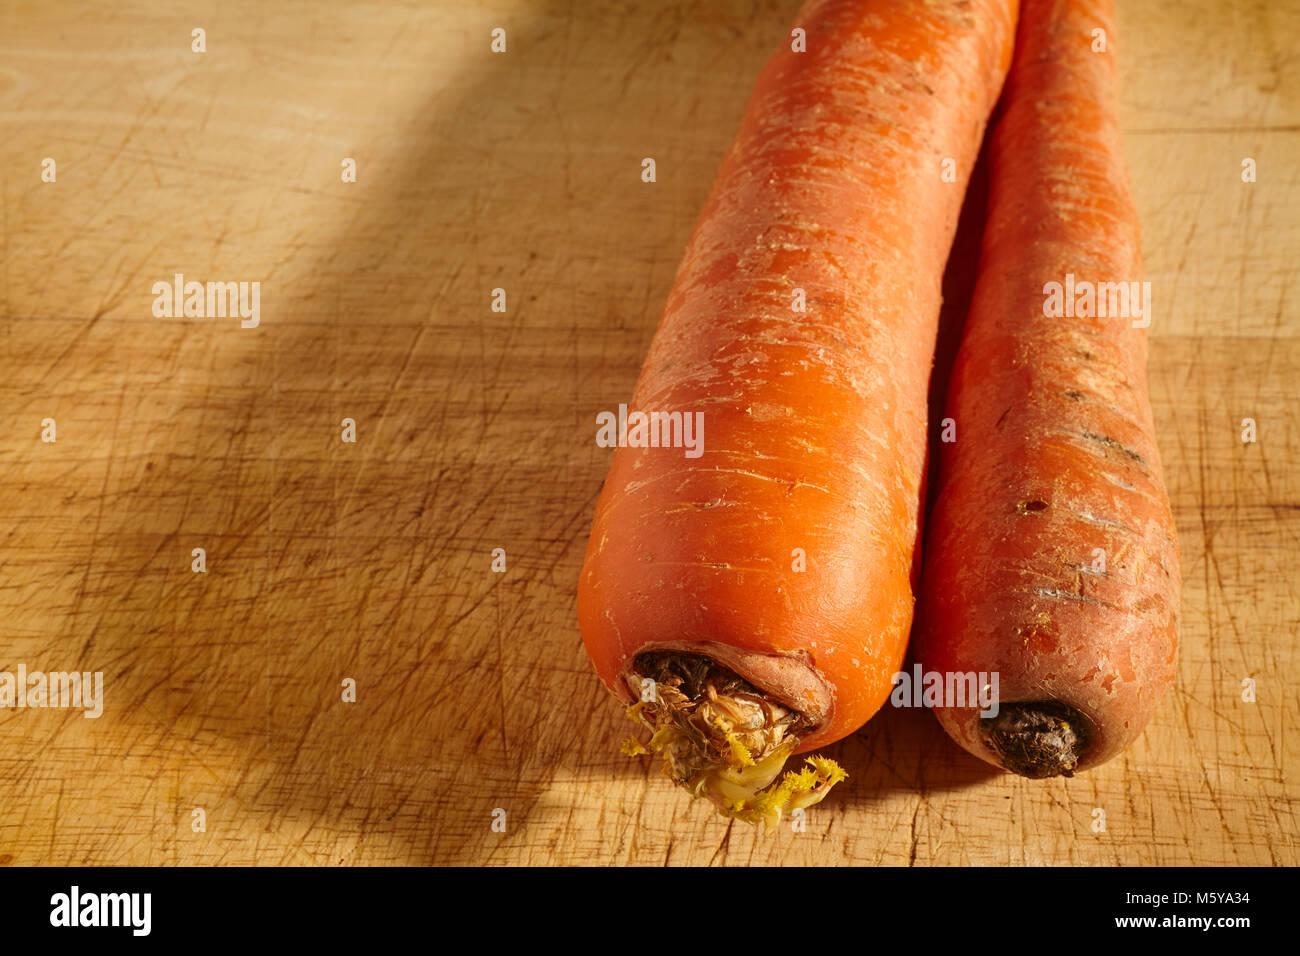 whole, fresh, raw carrot - Stock Image